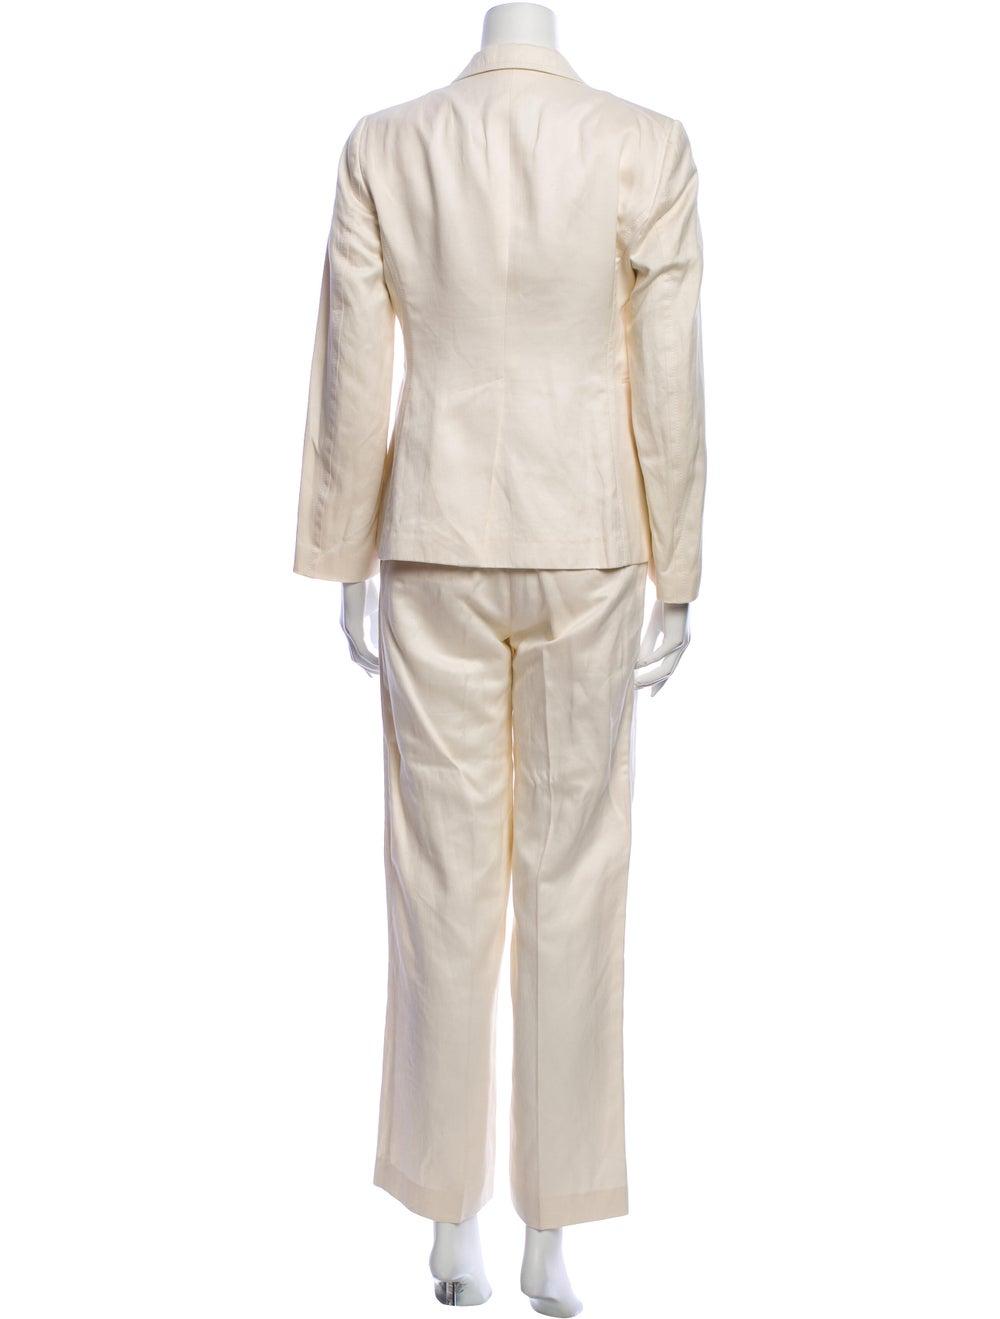 Costume National Pantsuit - image 3